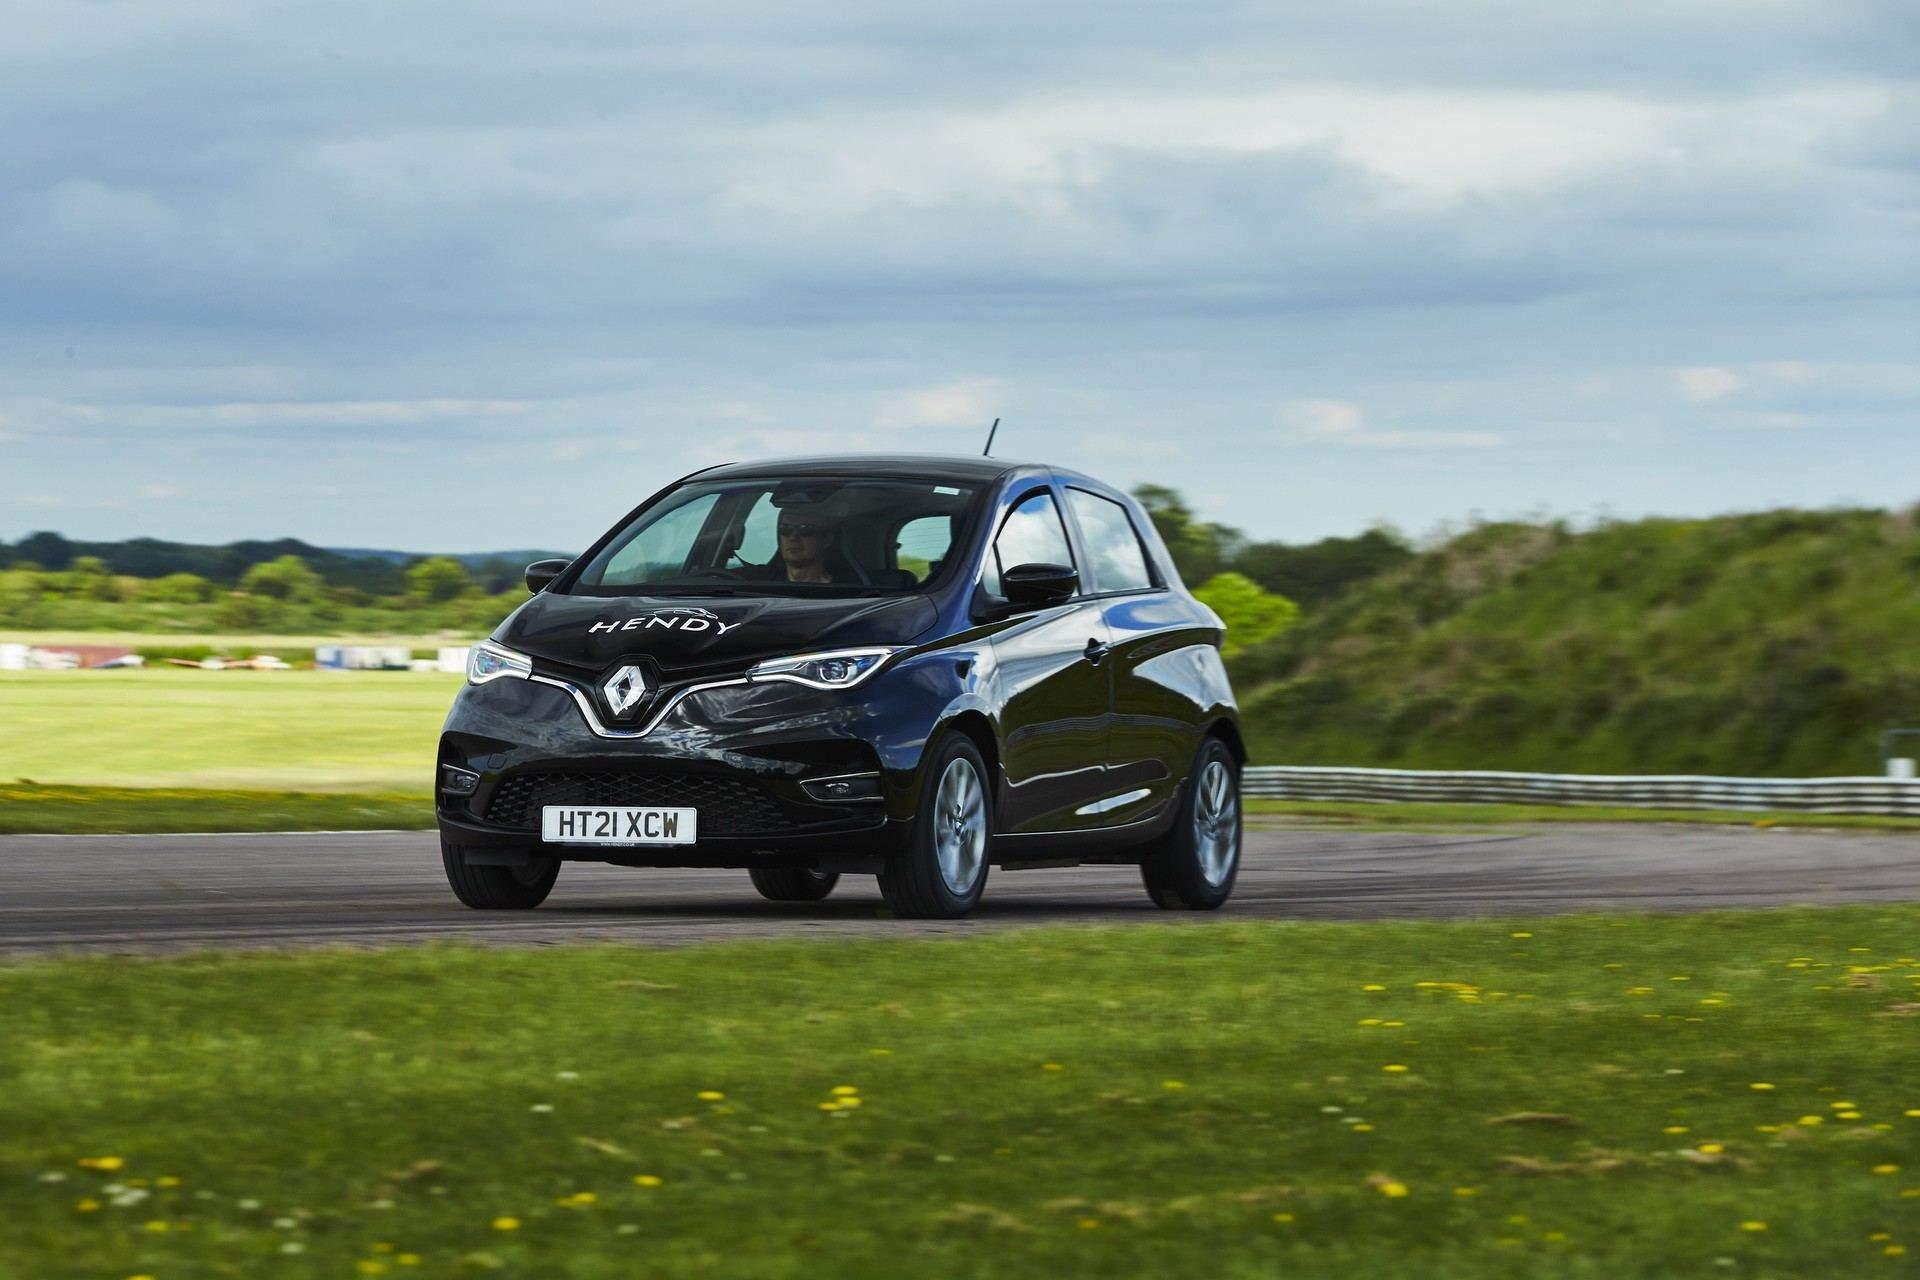 Renault_Zoe_hypermiling_record-0010